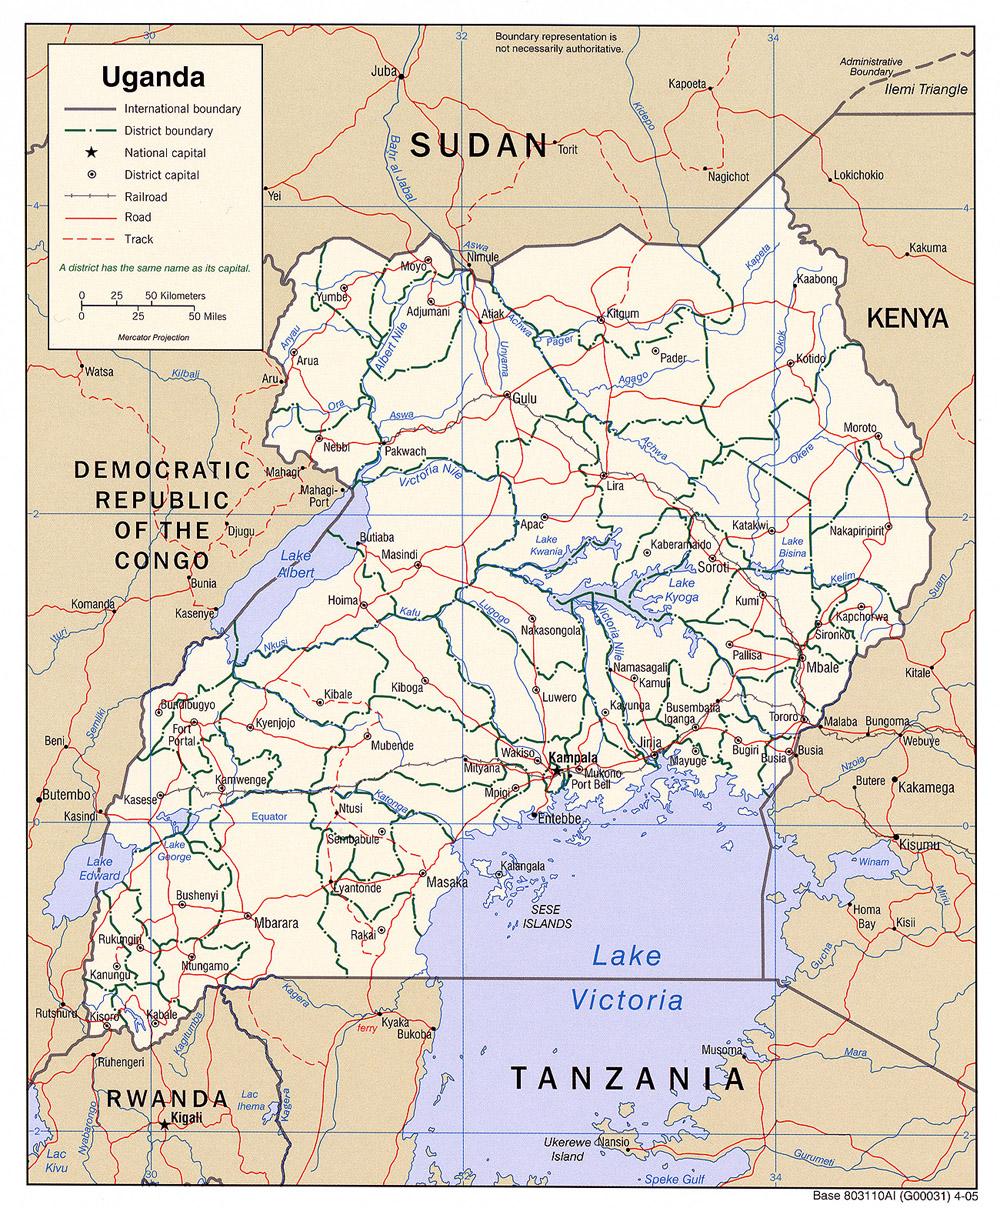 Map of Uganda (Political Map) : Weltkarte.com - Karten und ...